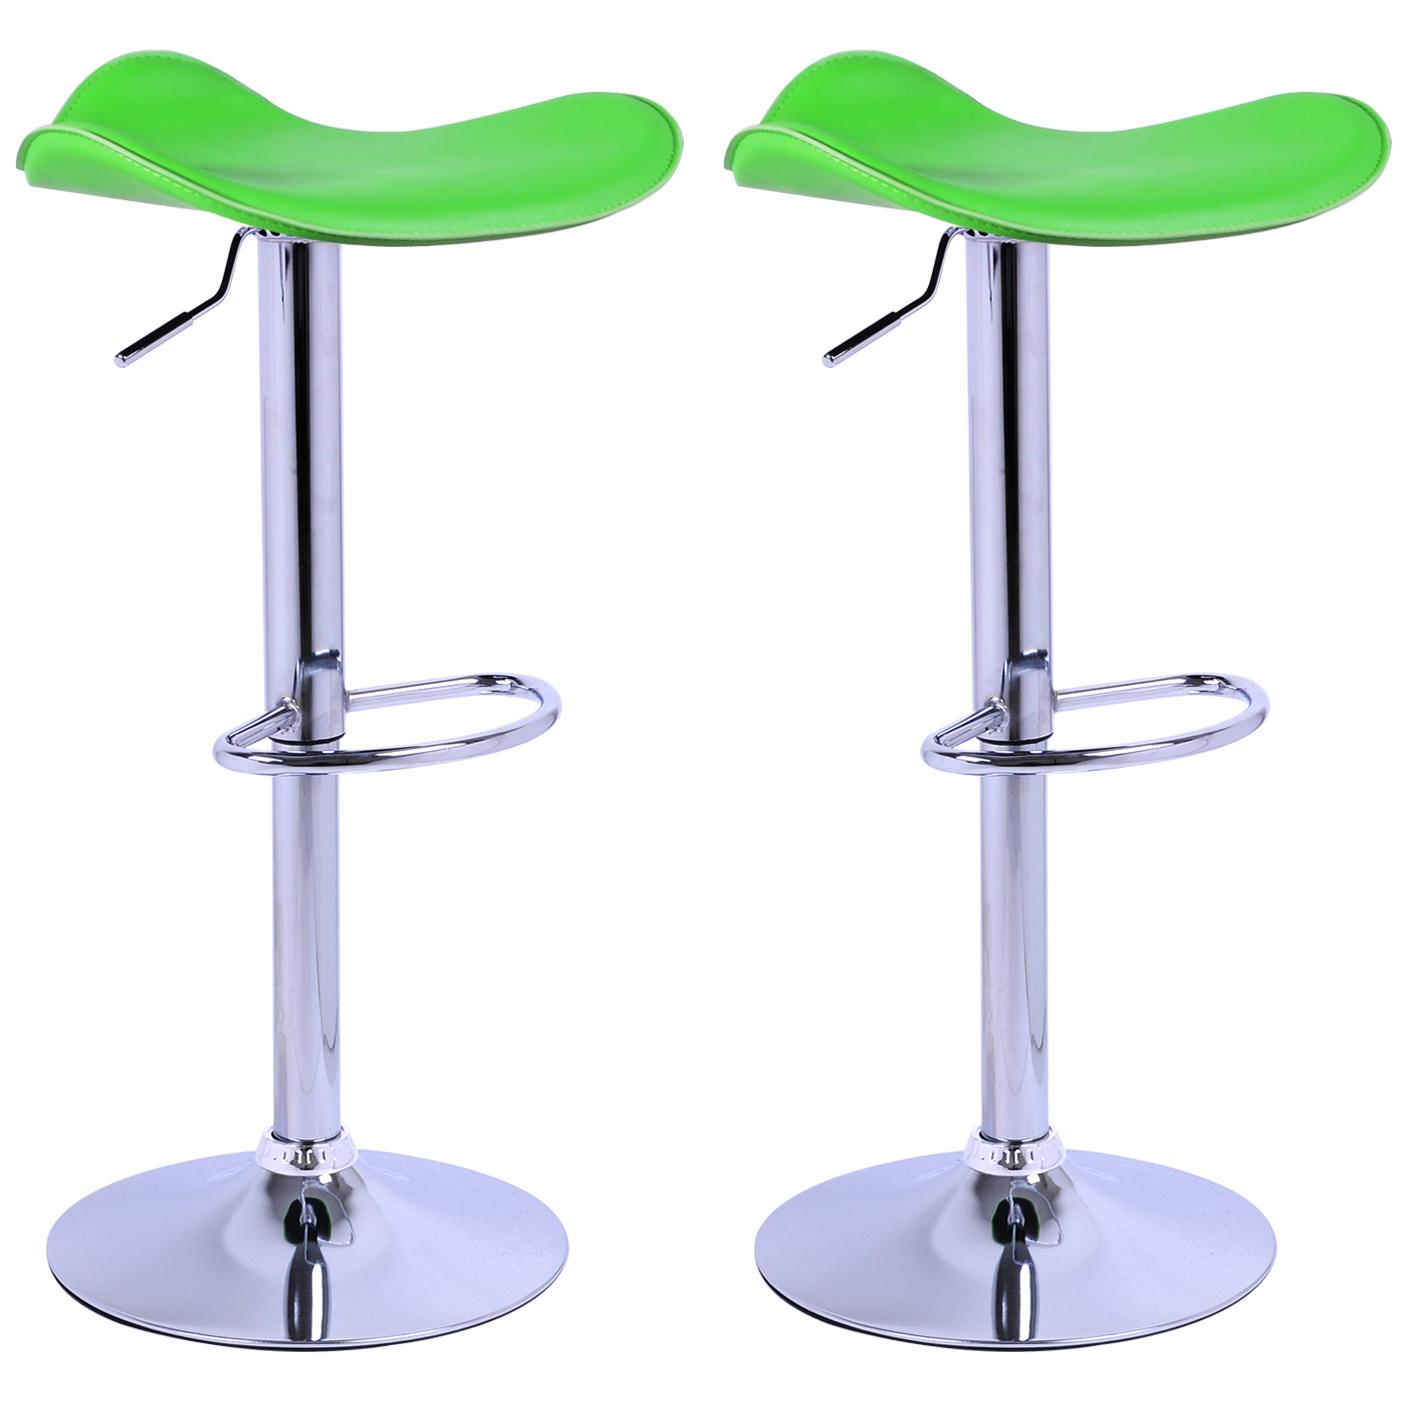 Green Kitchen Stools: Bar Stools Set Of 2/1 Breakfast Kitchen Chair Adjustable